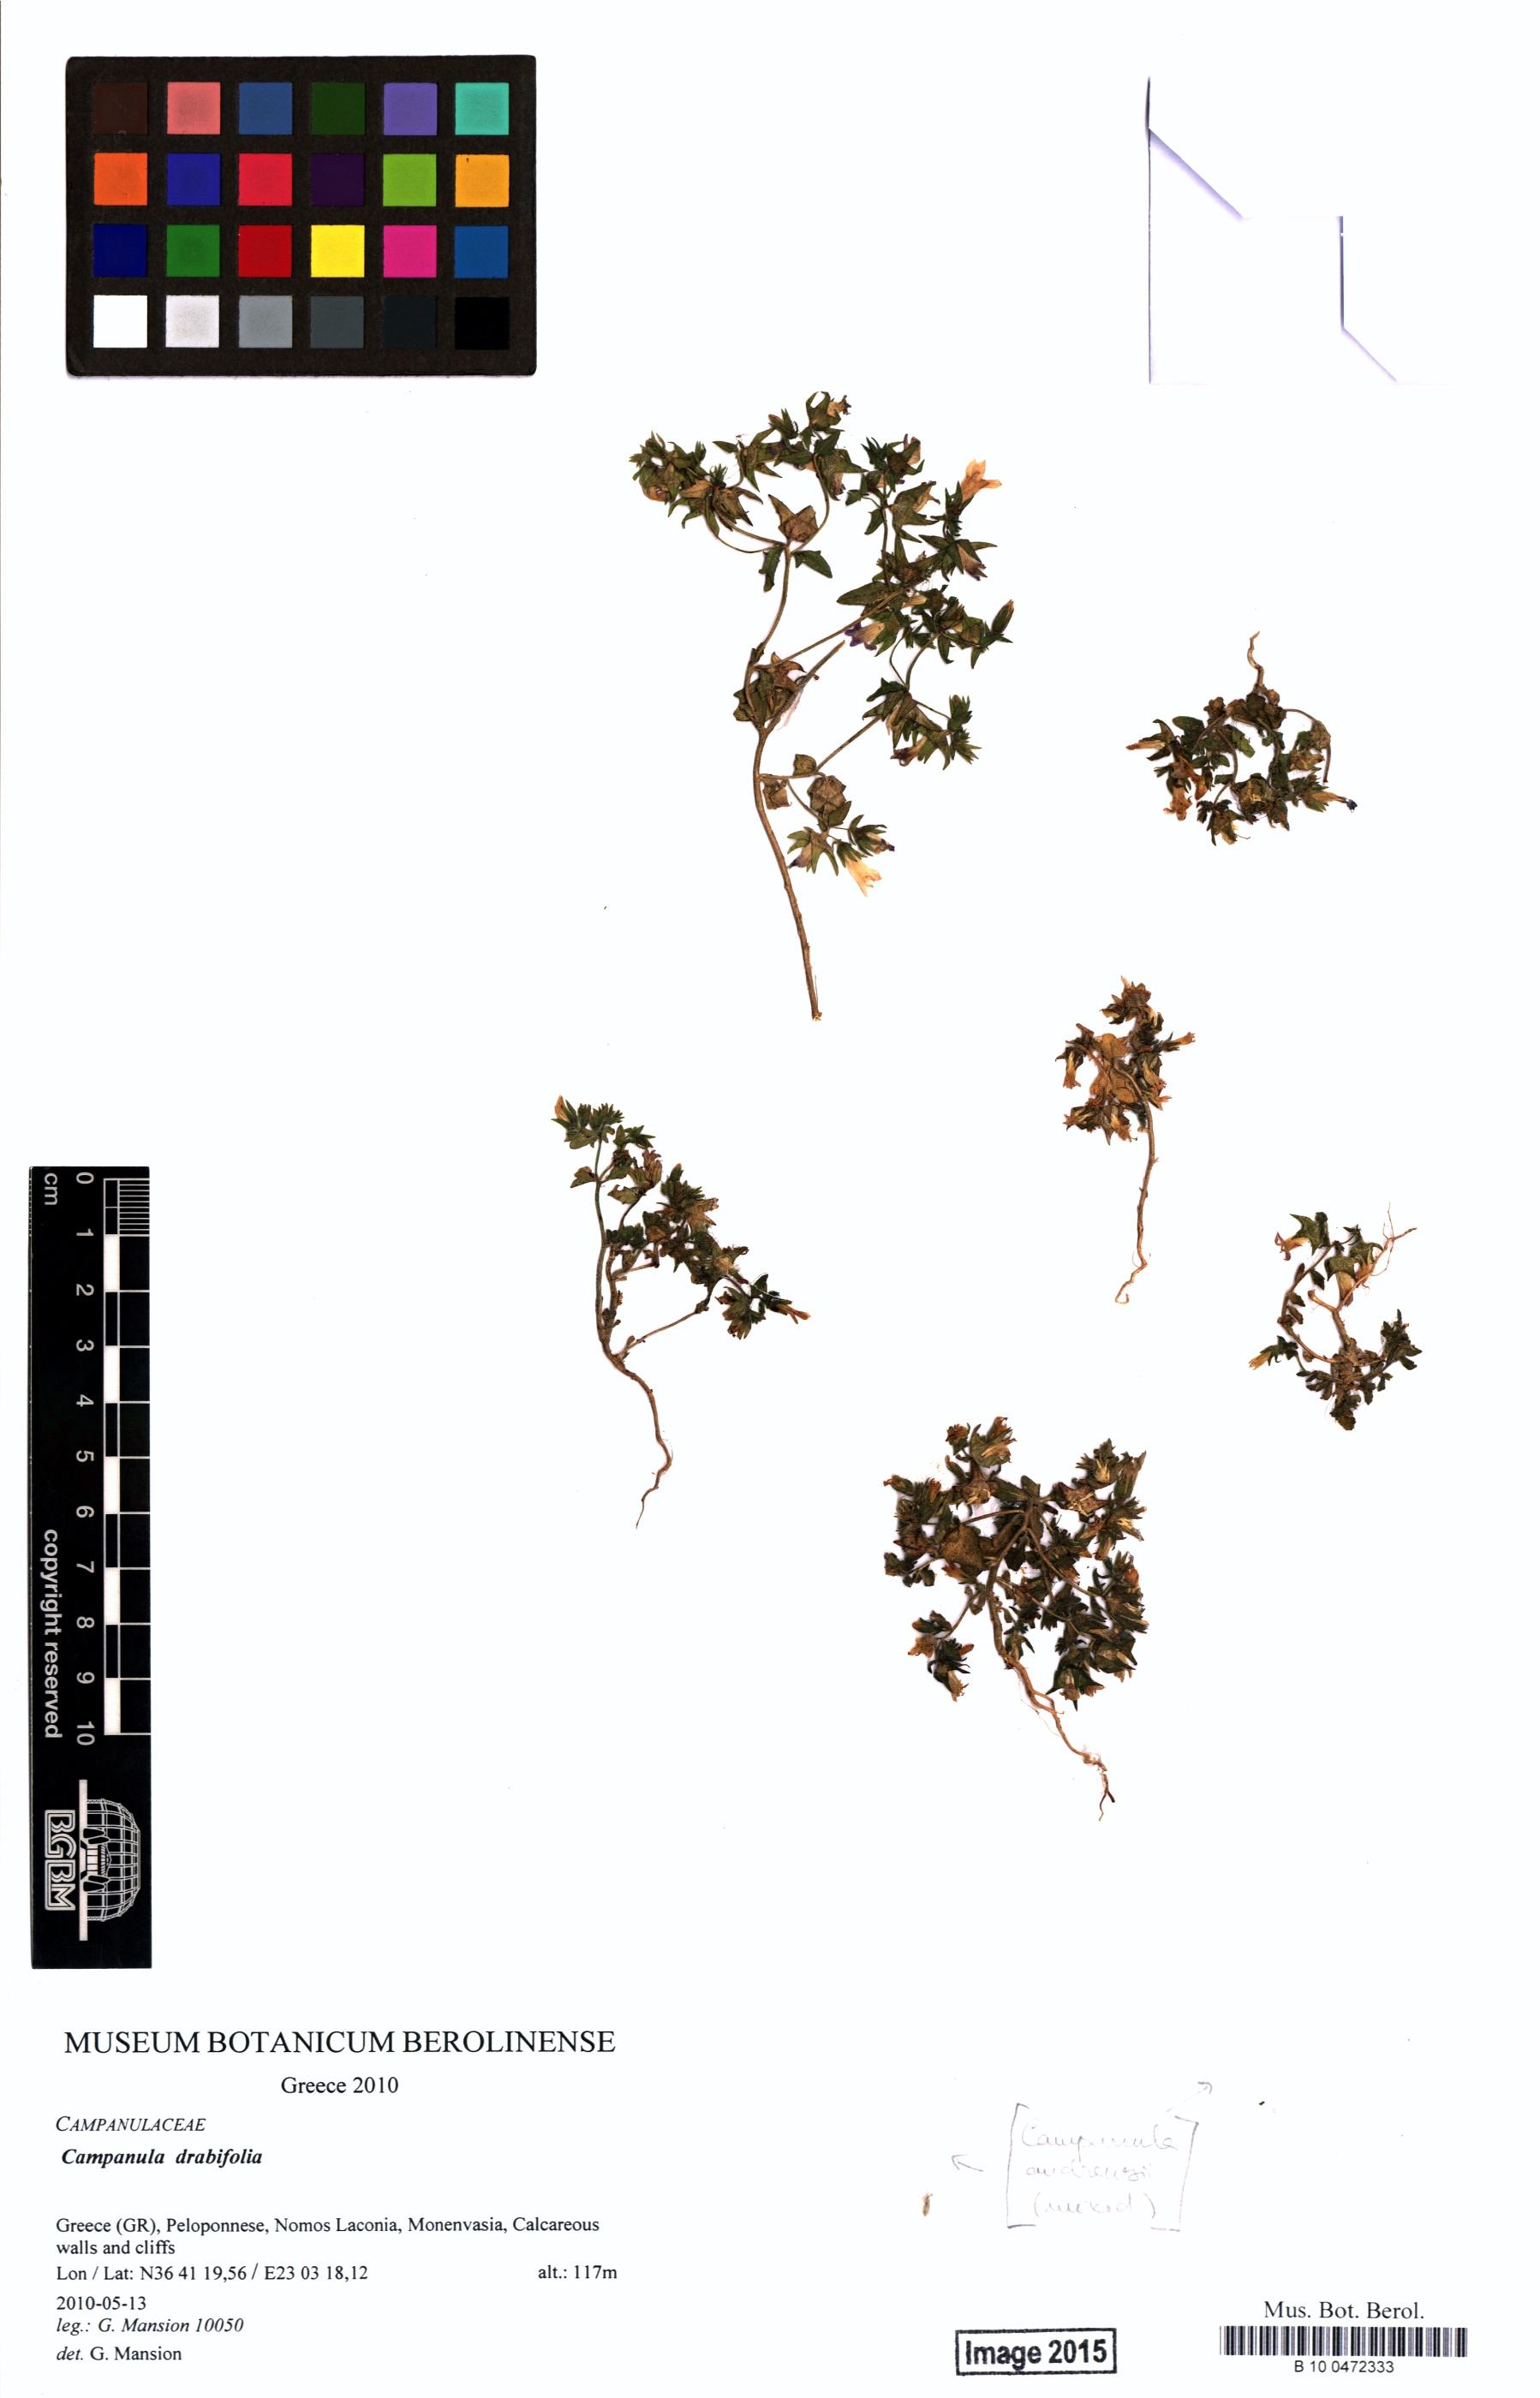 http://ww2.bgbm.org/herbarium/images/B/10/04/72/33/B_10_0472333.jpg